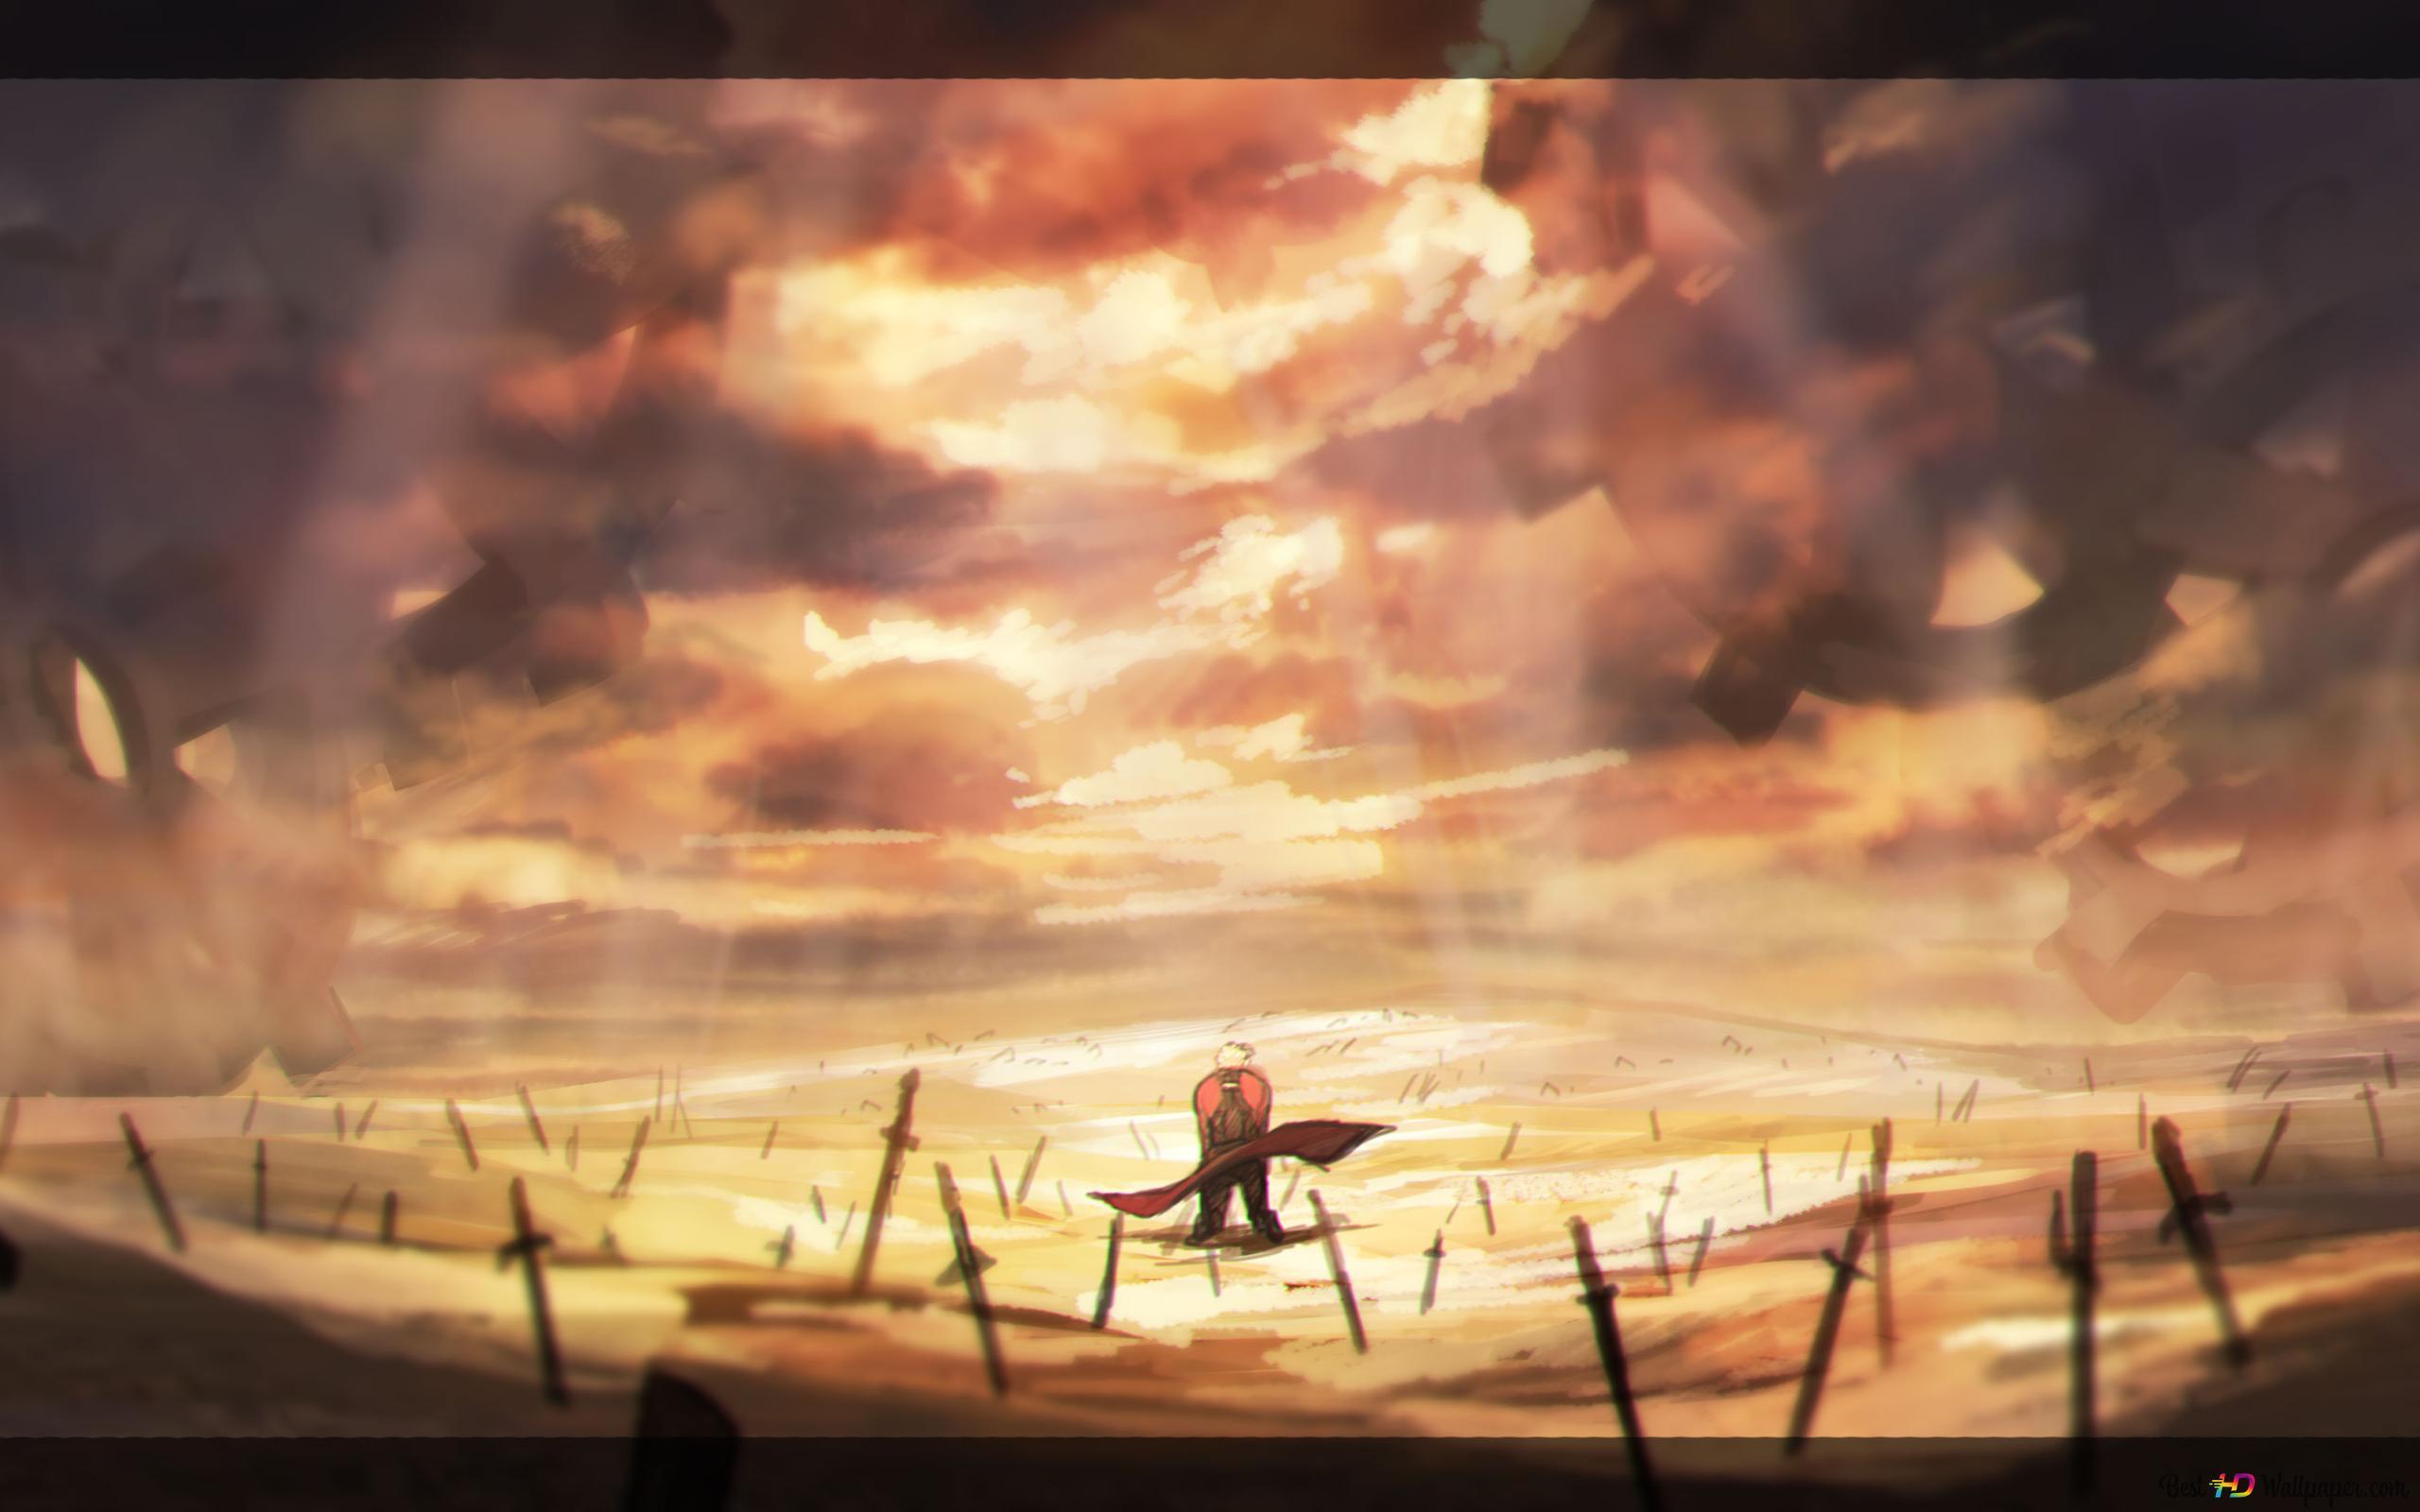 Fate Stay Night Ubw 壁紙 Fate Stay Night Ubw 壁紙 あなたのための最高の壁紙画像